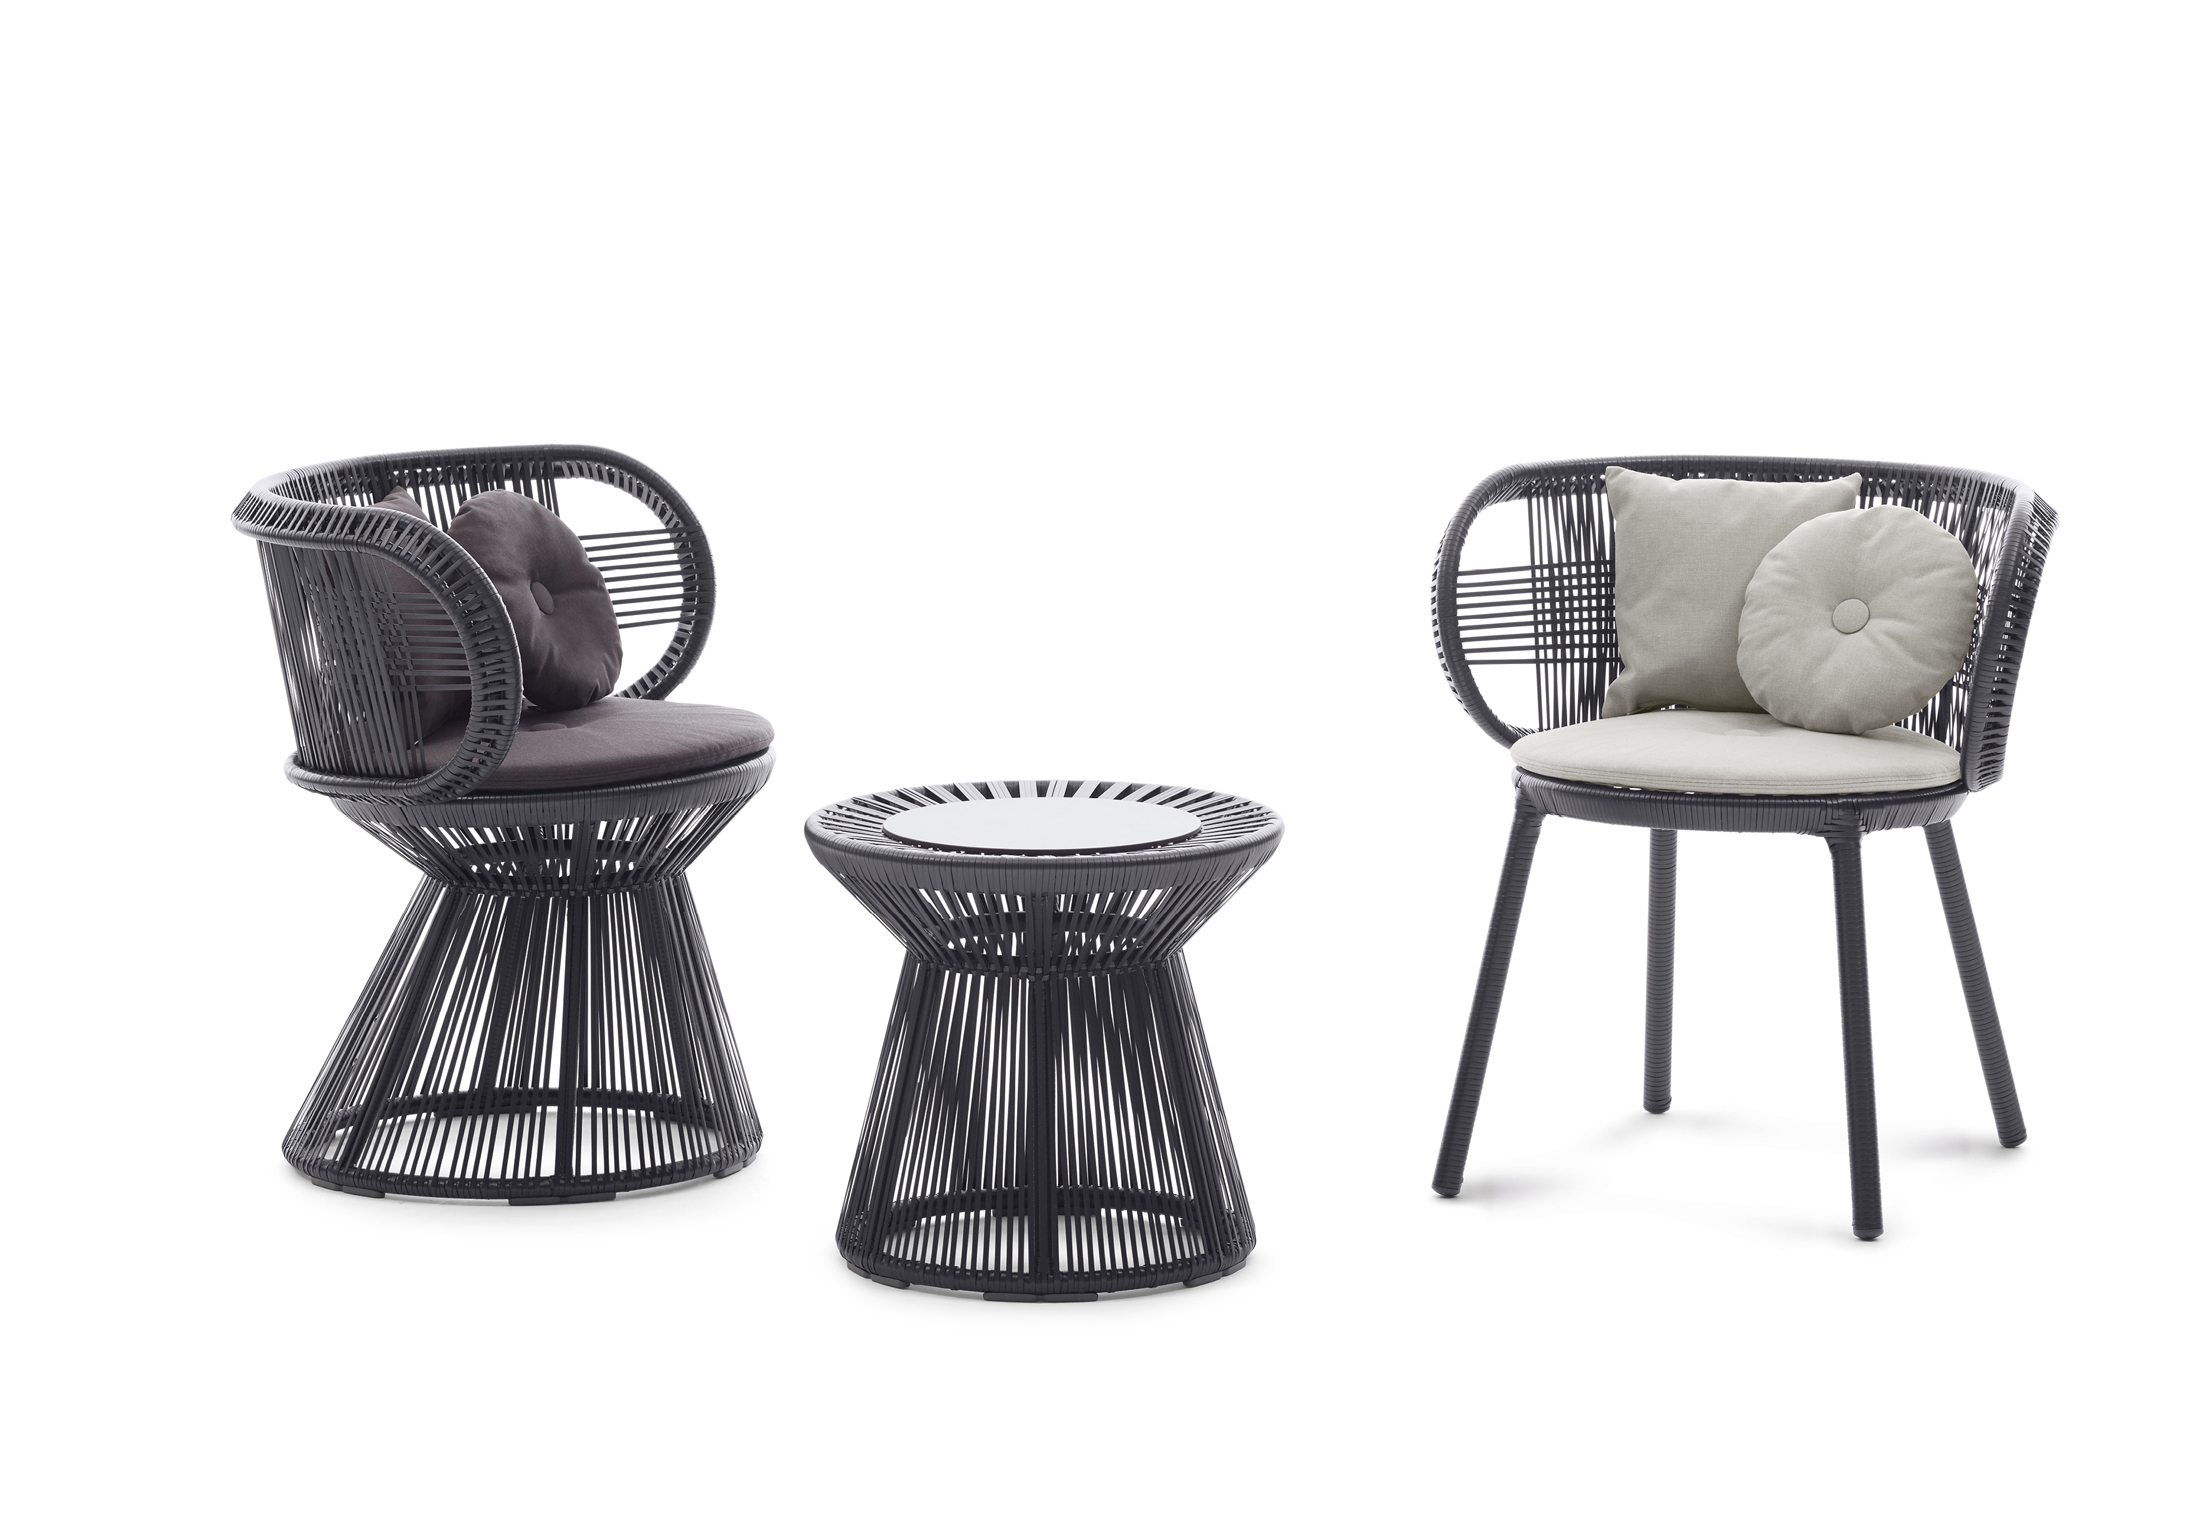 Miraculous Cirql Lounge Chair By Dedon Stylepark Machost Co Dining Chair Design Ideas Machostcouk